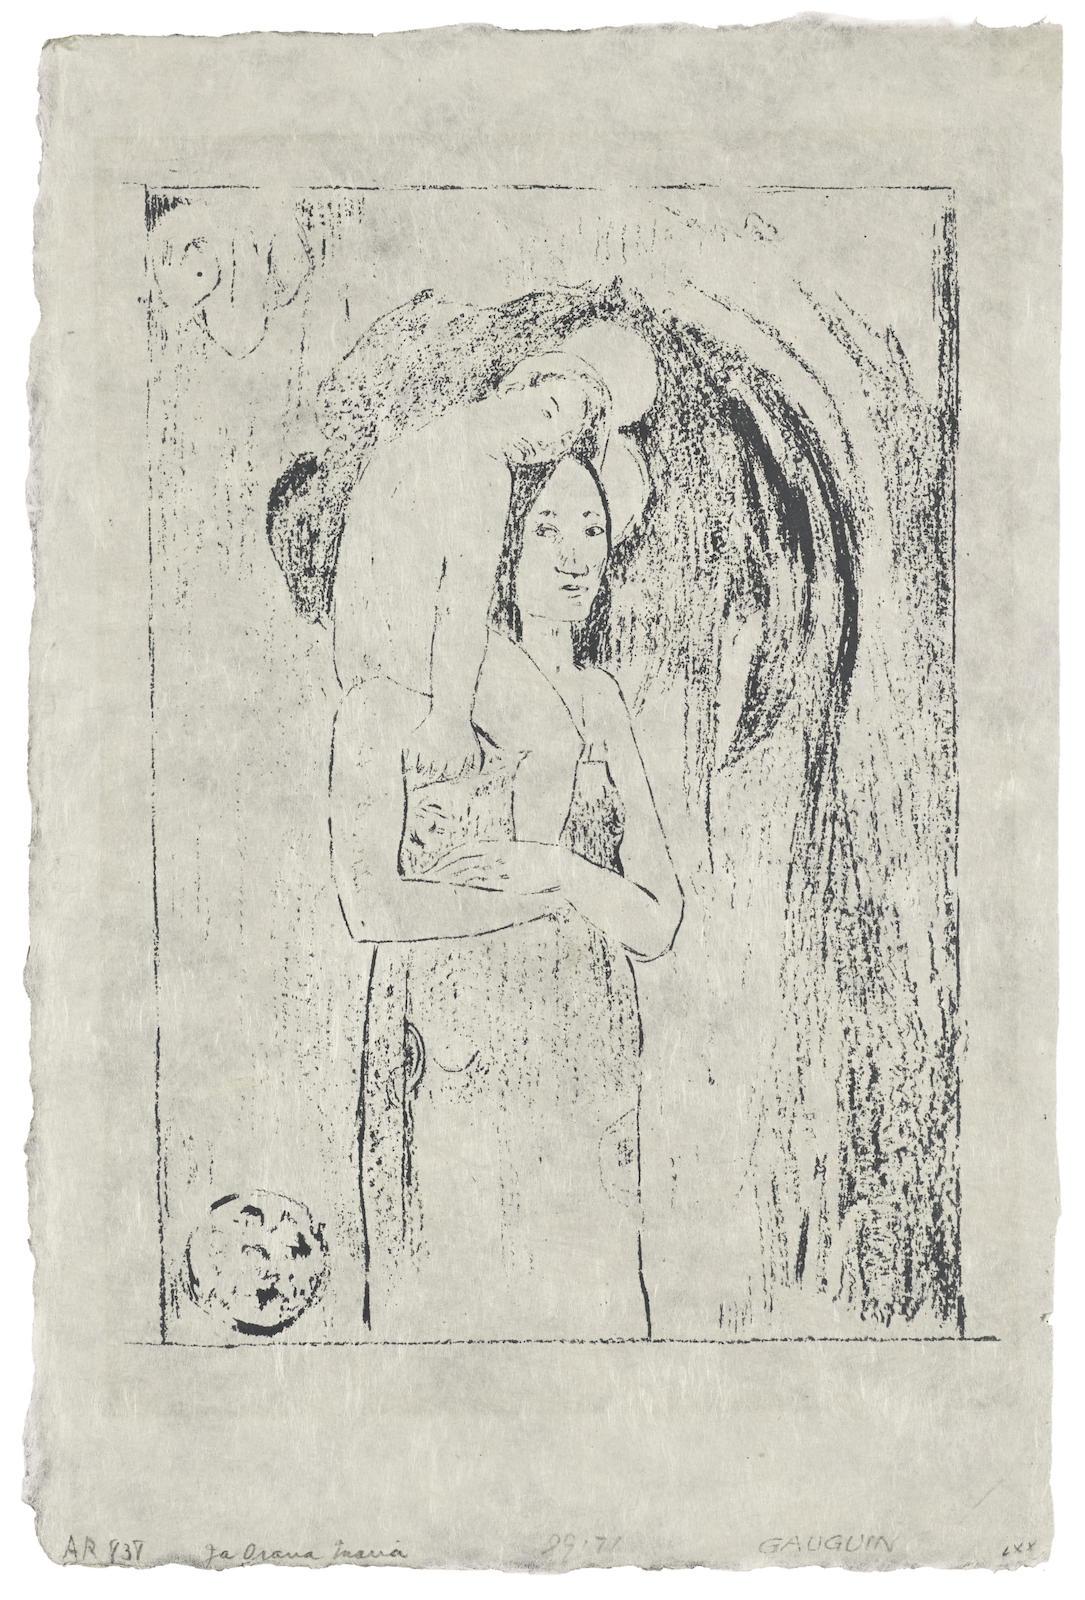 Paul Gauguin-La Orana Maria (G. 51; K. 27)-1895